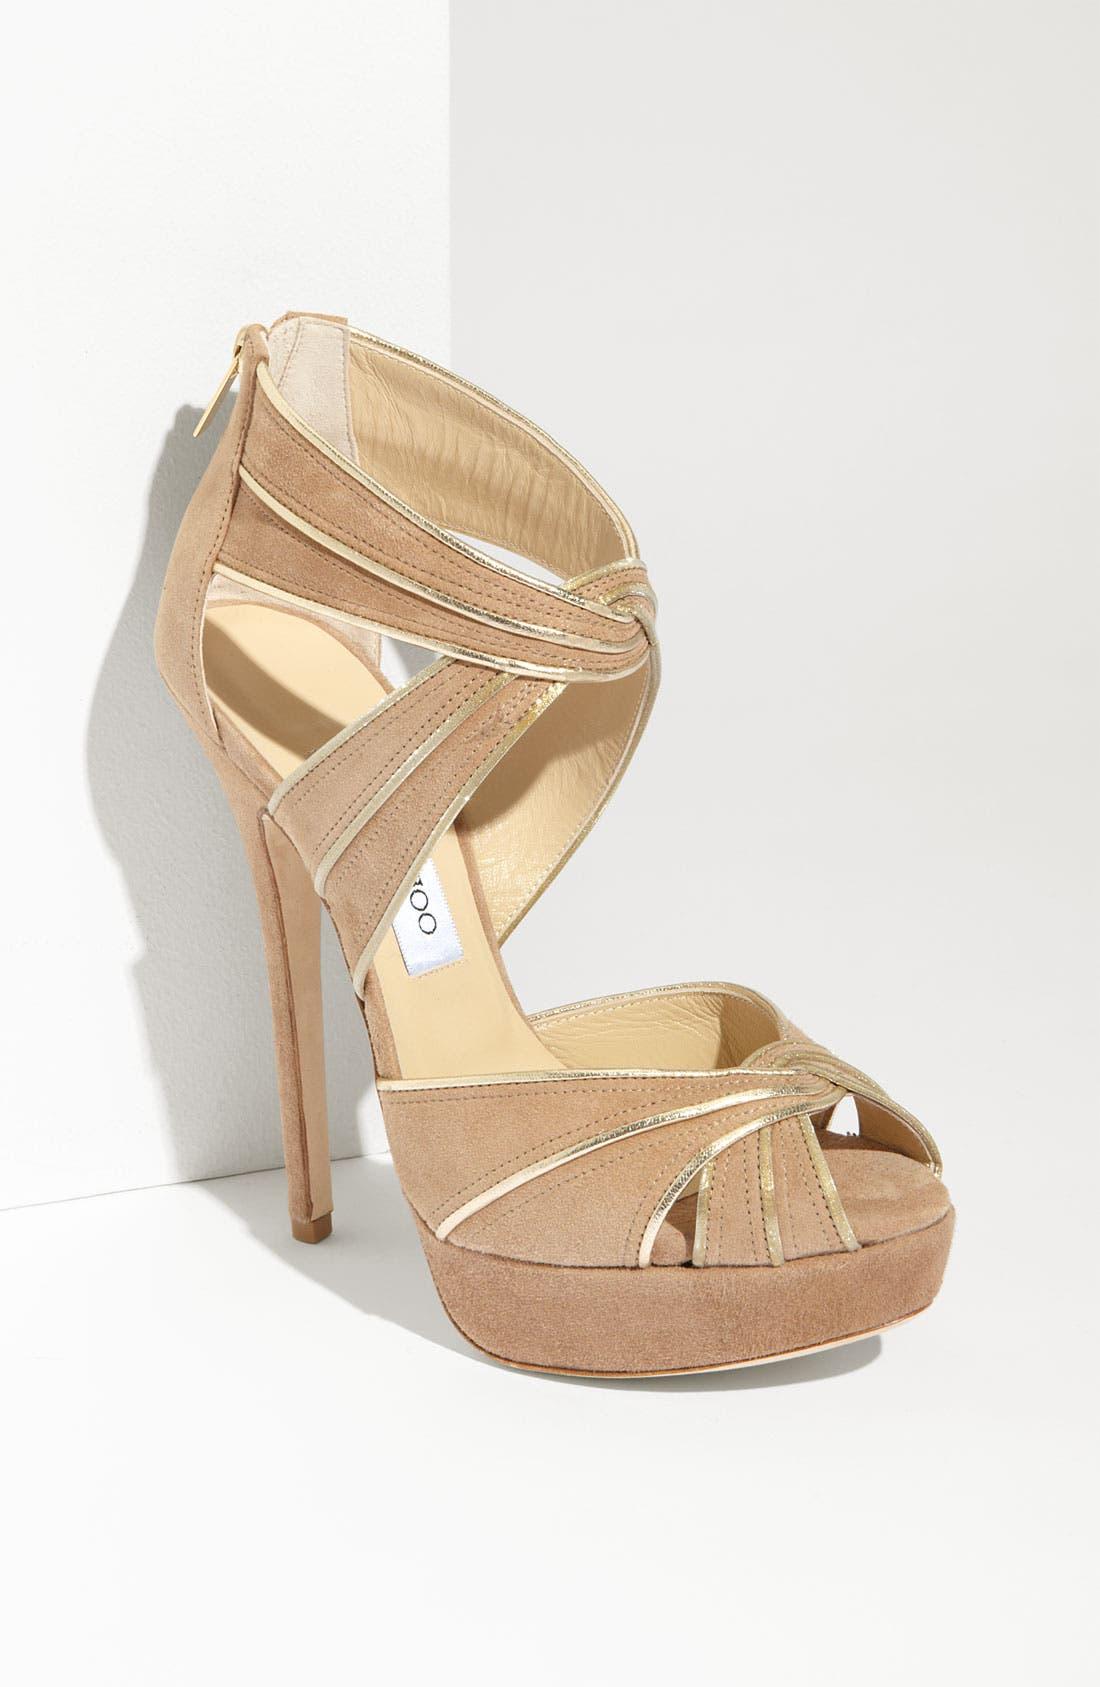 Alternate Image 1 Selected - Jimmy Choo 'Koko' Piped Platform Sandal